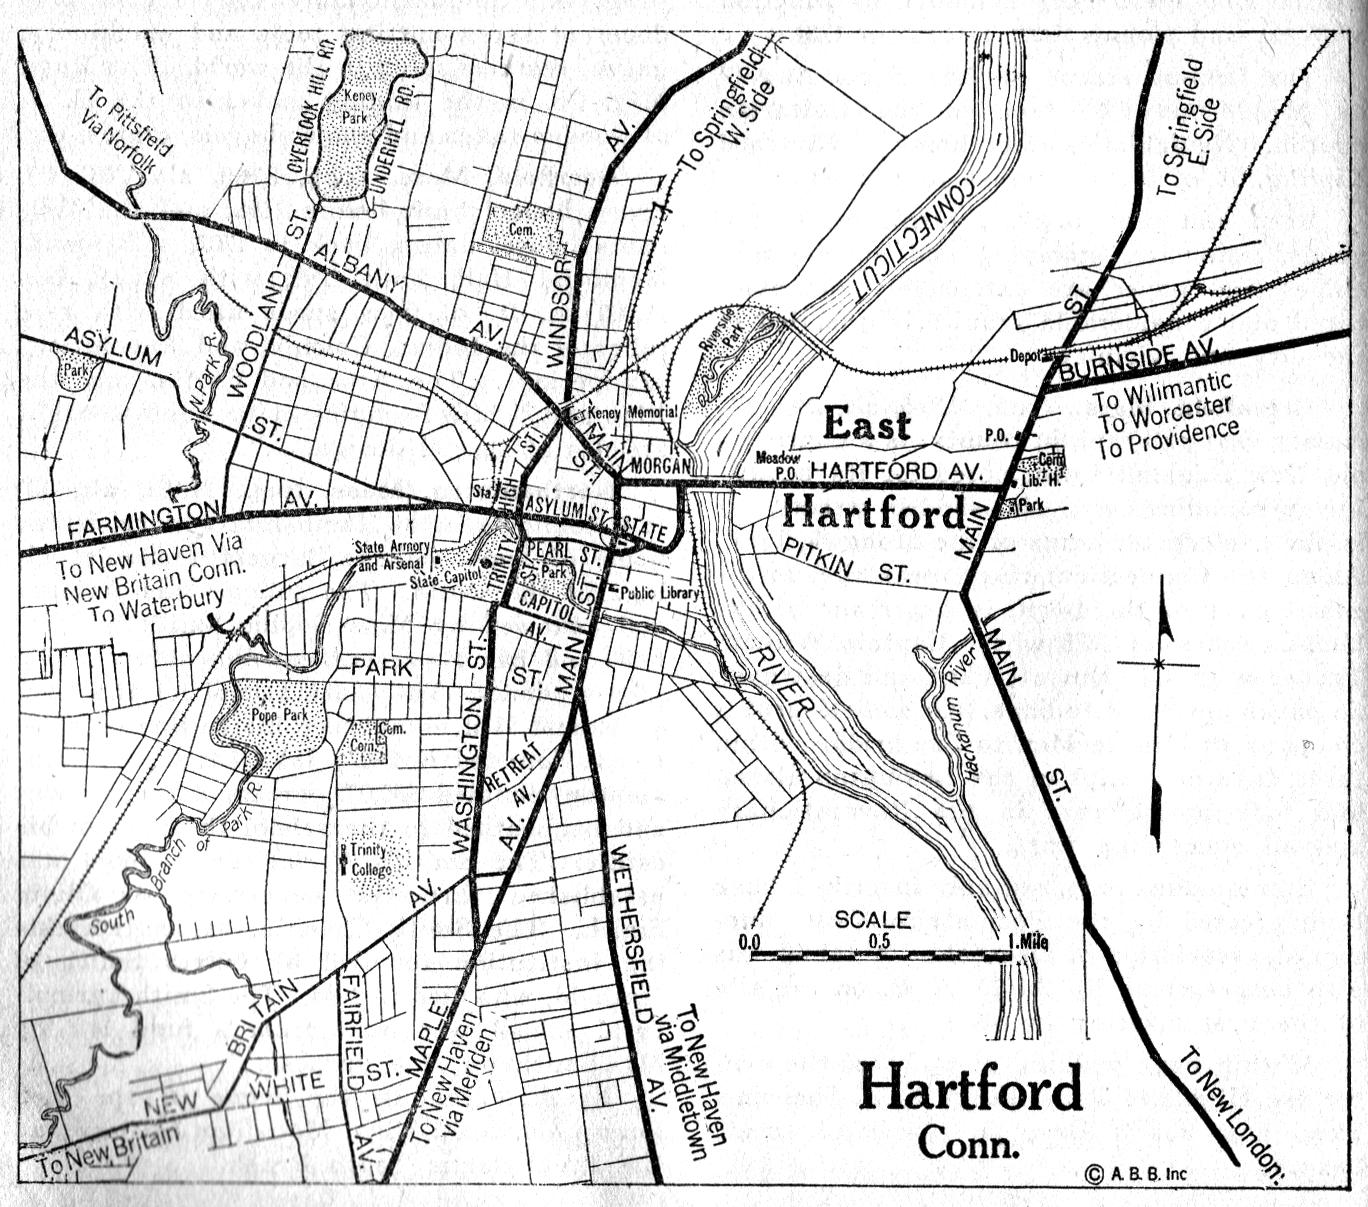 Connecticut City Maps at AmericanRoads.com